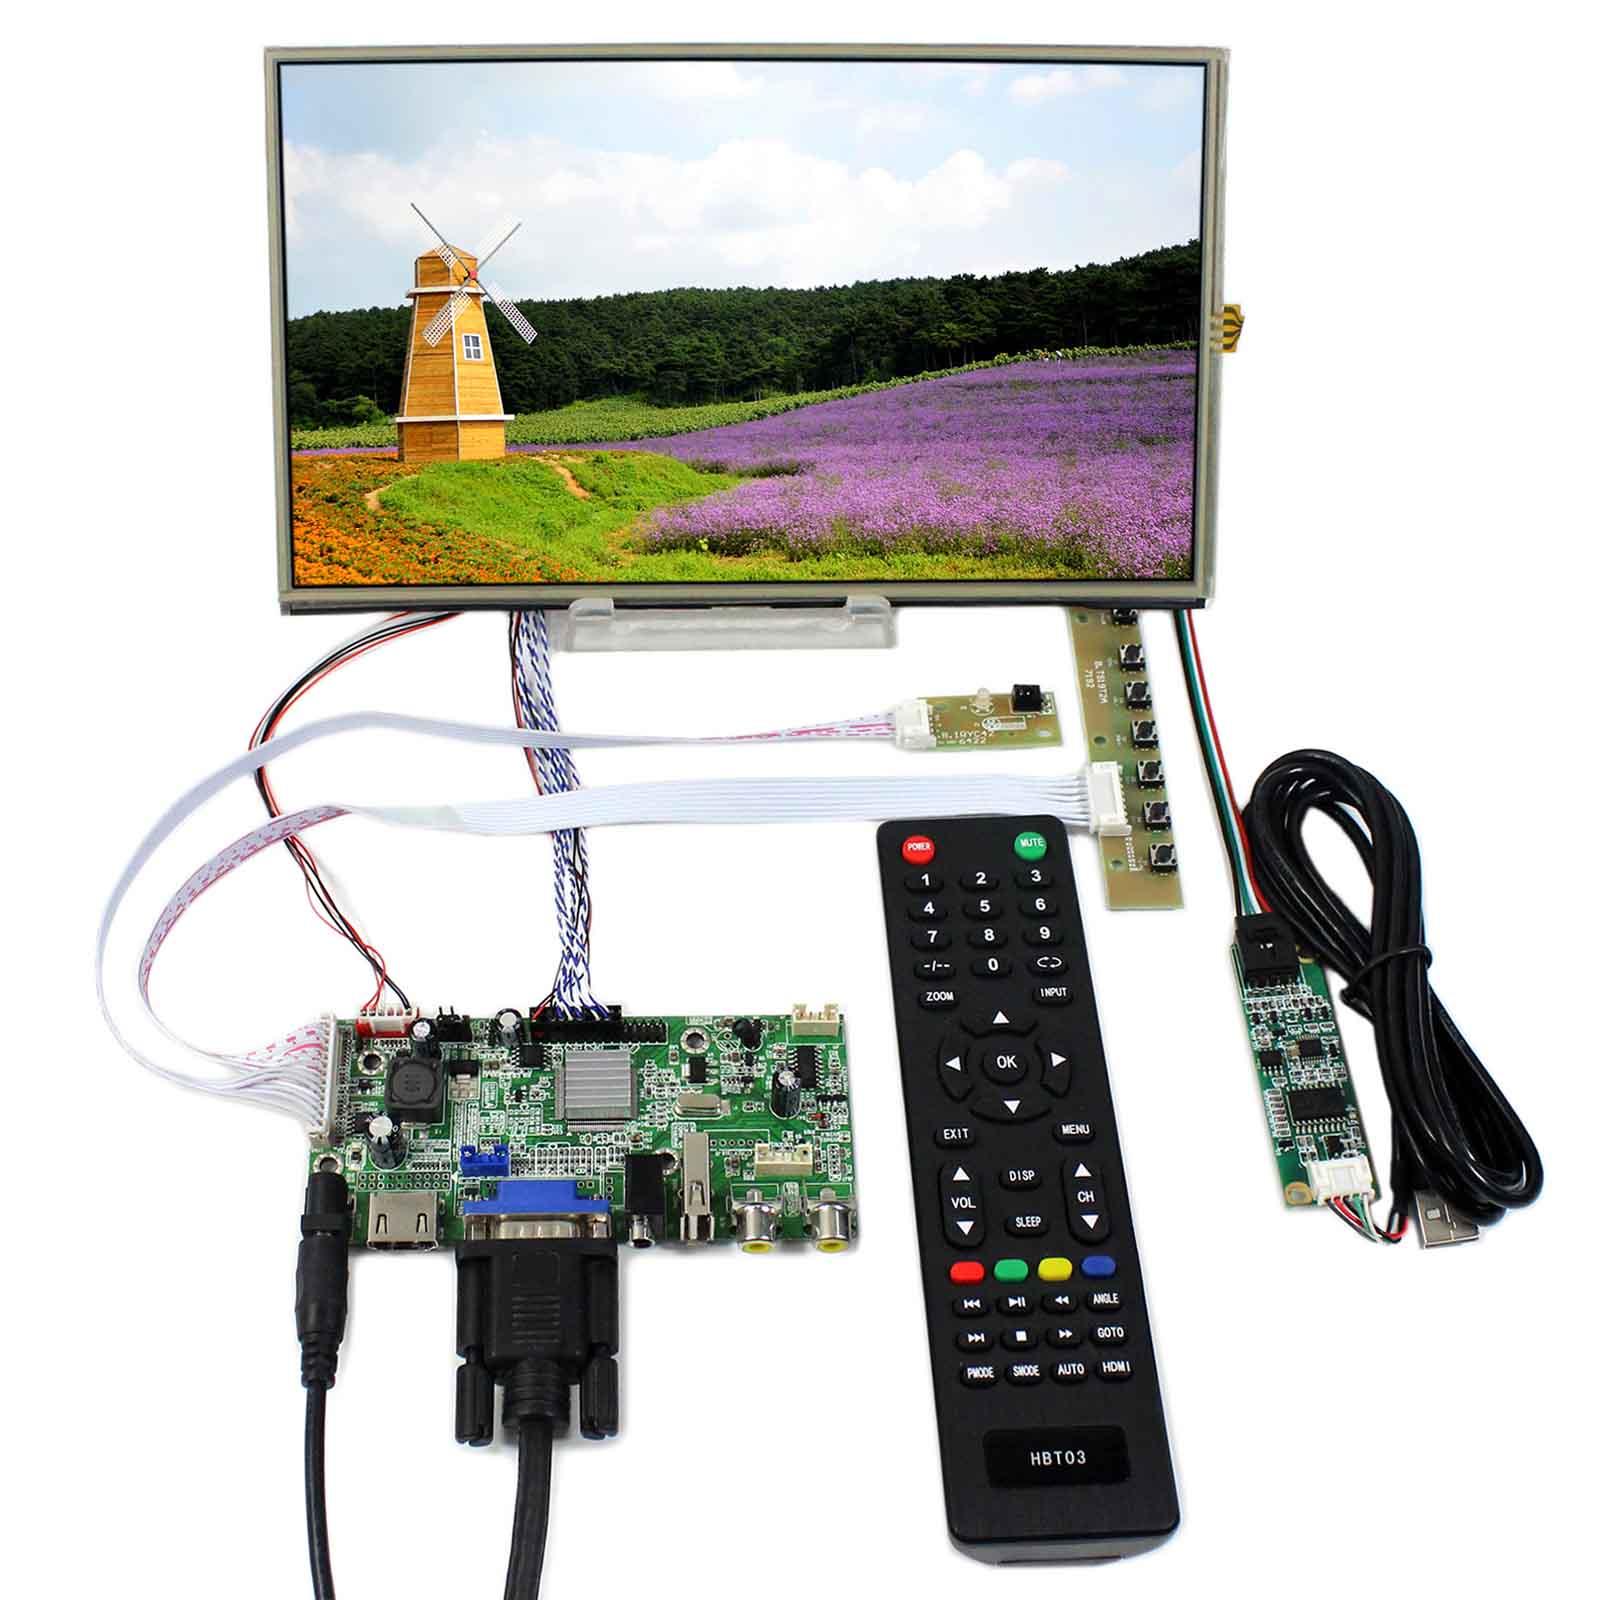 HDMI VGA 2AV USB Audio LCD Controller Board With 10.1 B101XAN01 1366x768 Touch LCD PanelHDMI VGA 2AV USB Audio LCD Controller Board With 10.1 B101XAN01 1366x768 Touch LCD Panel